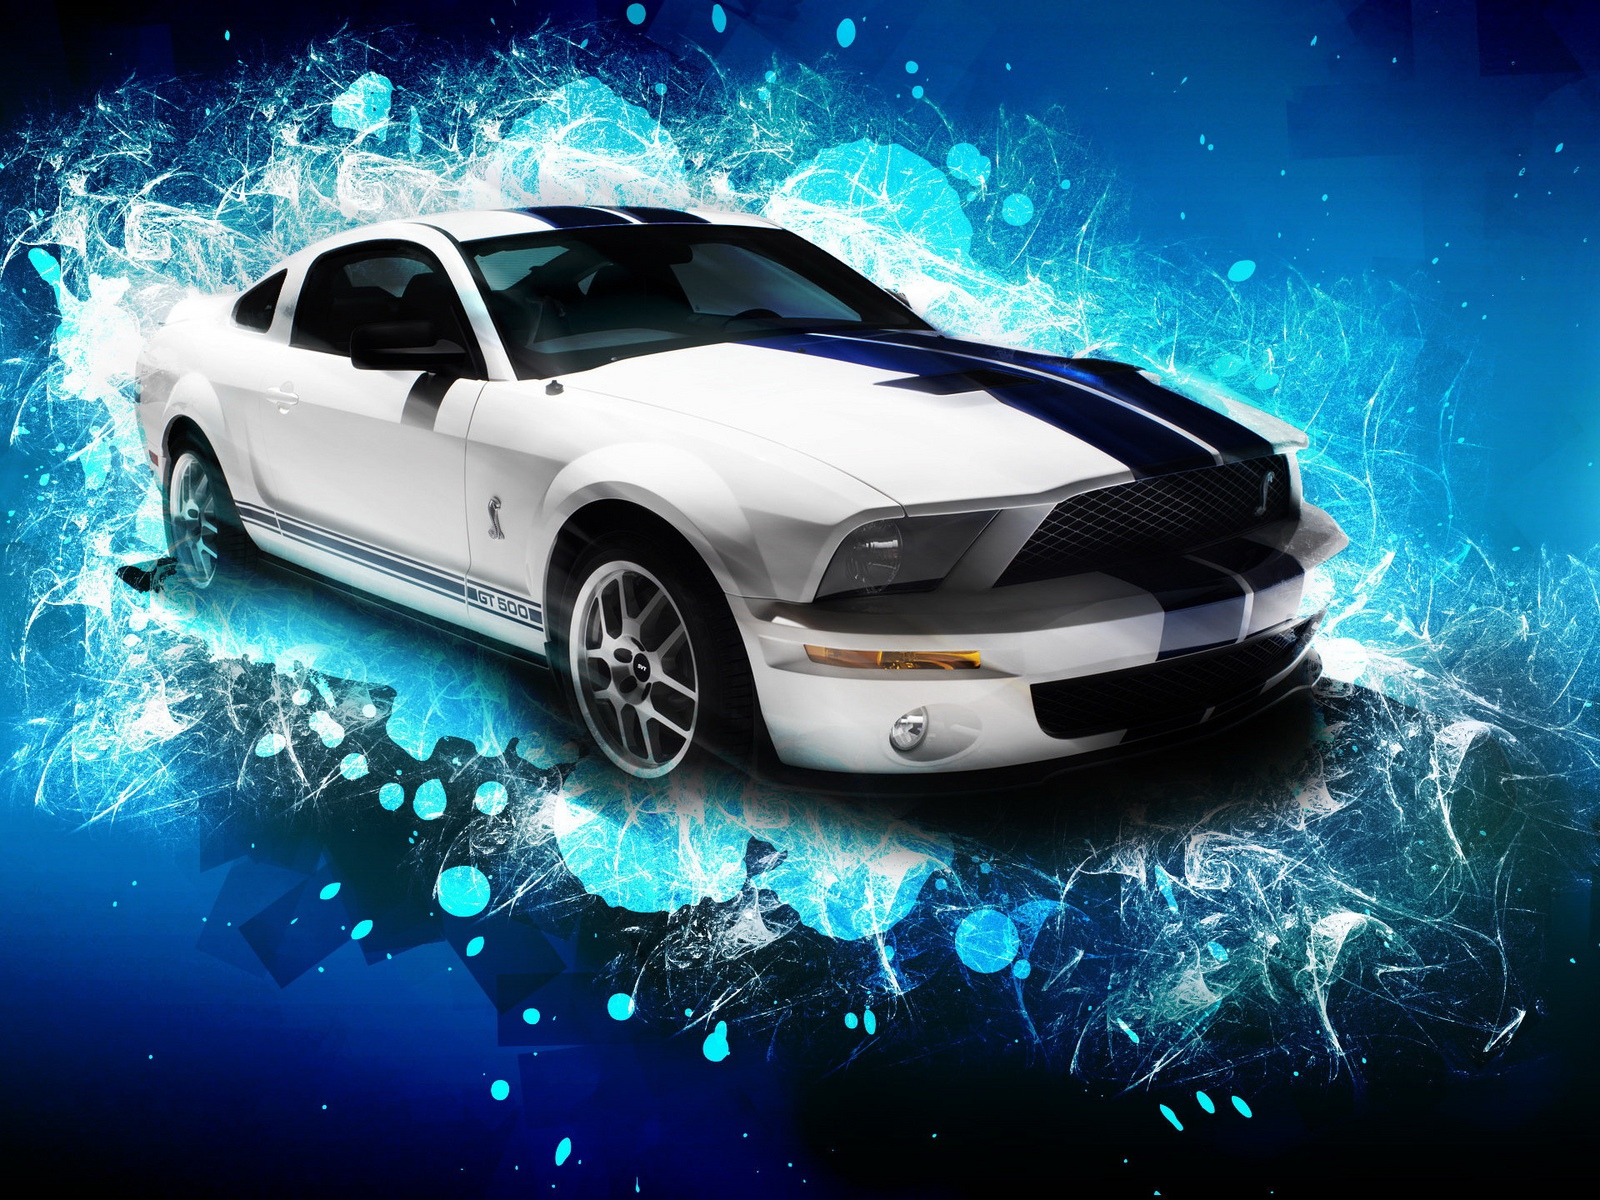 hd car s